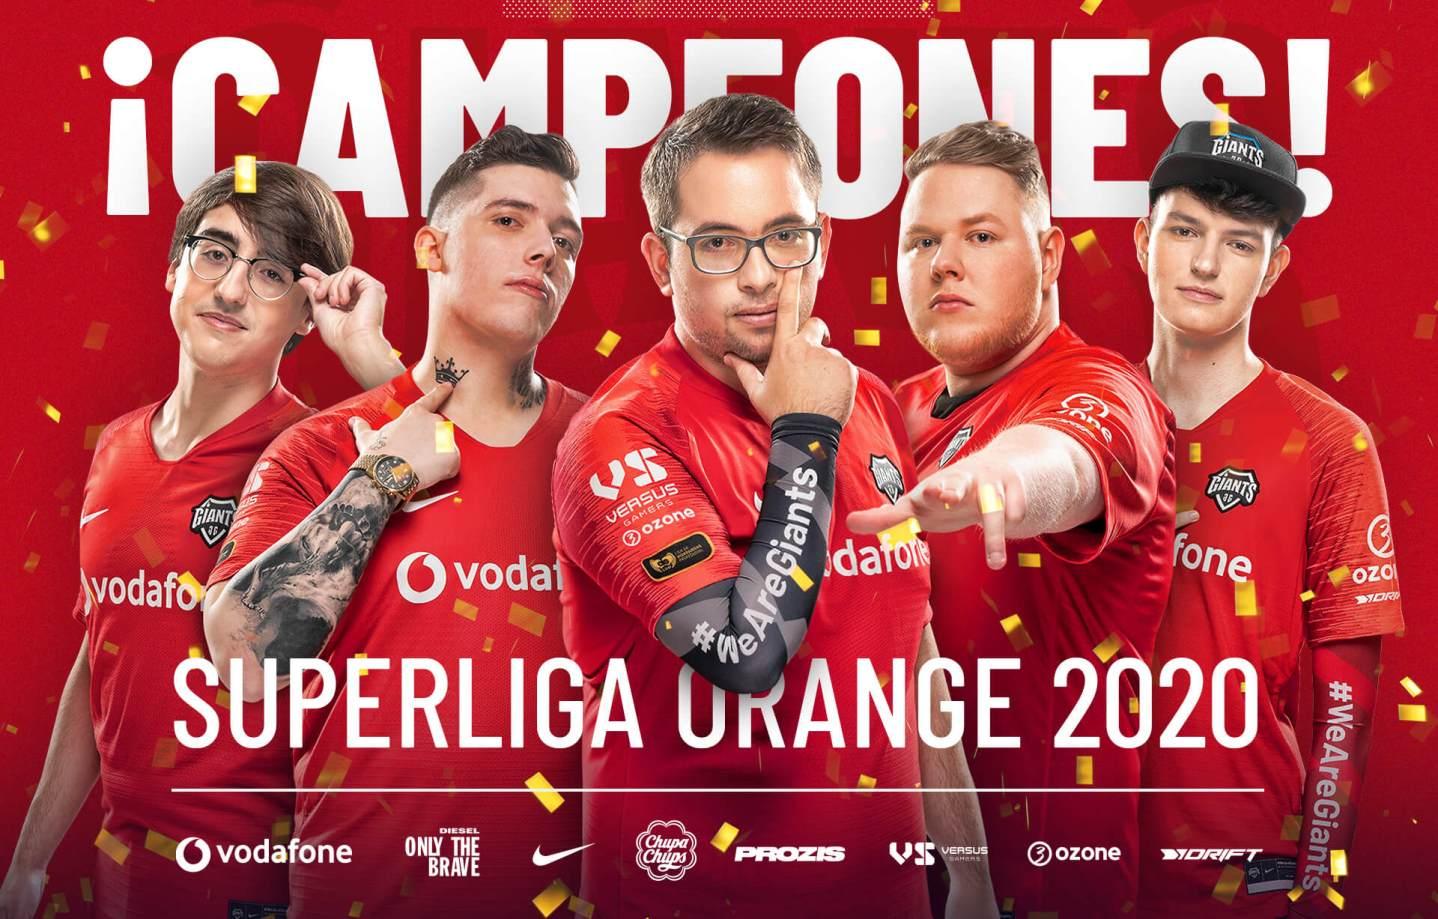 Vodafone Giants campeones superliga